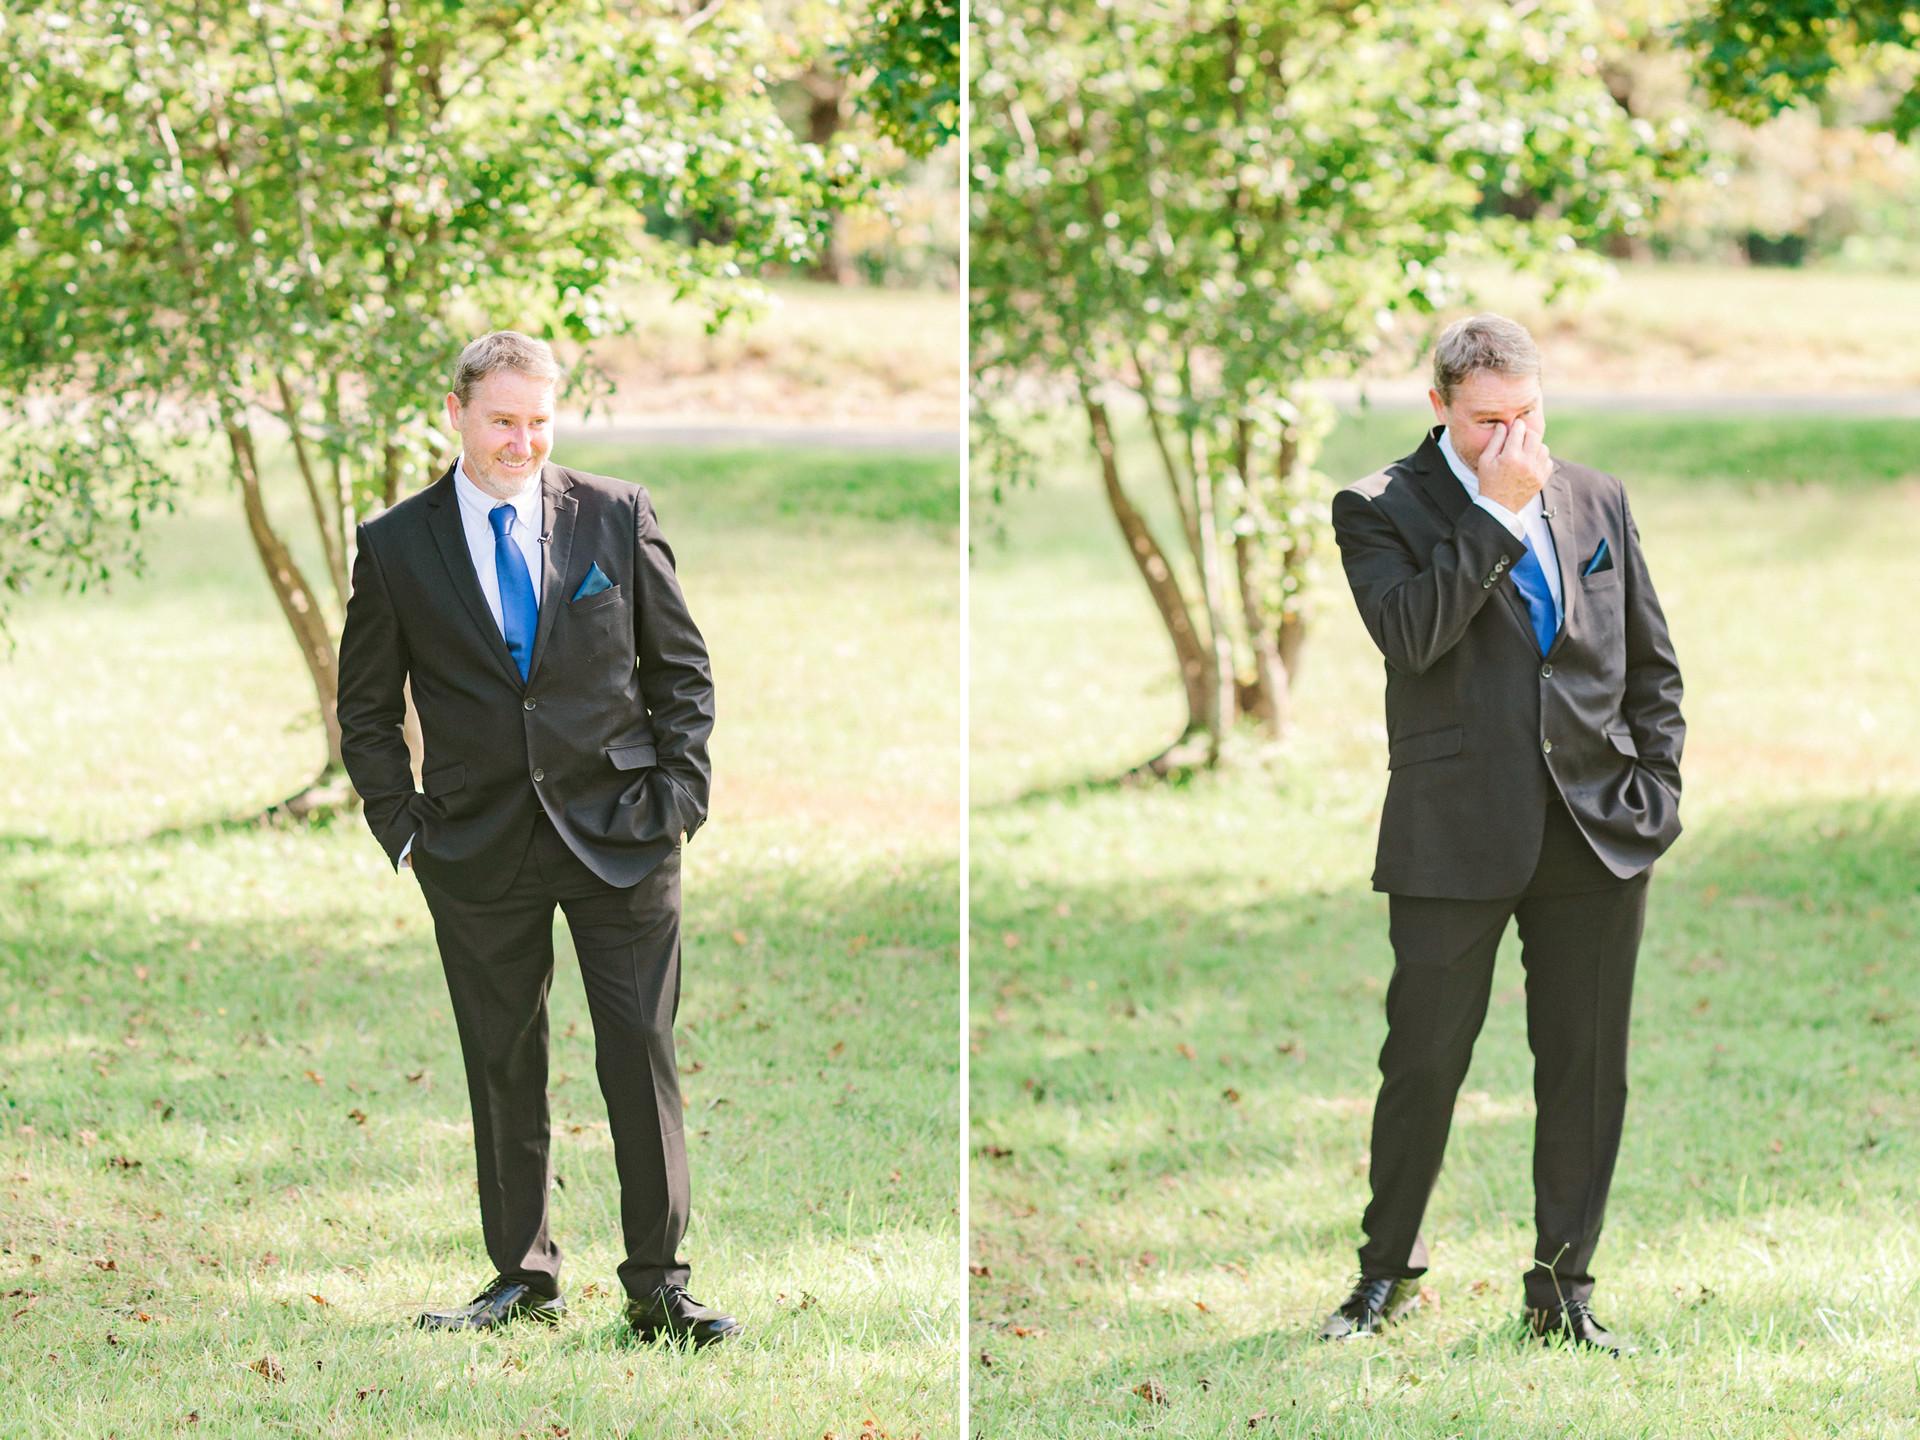 Sawyer + Summer Wedding at Kylee Cooper Farms in Alabama